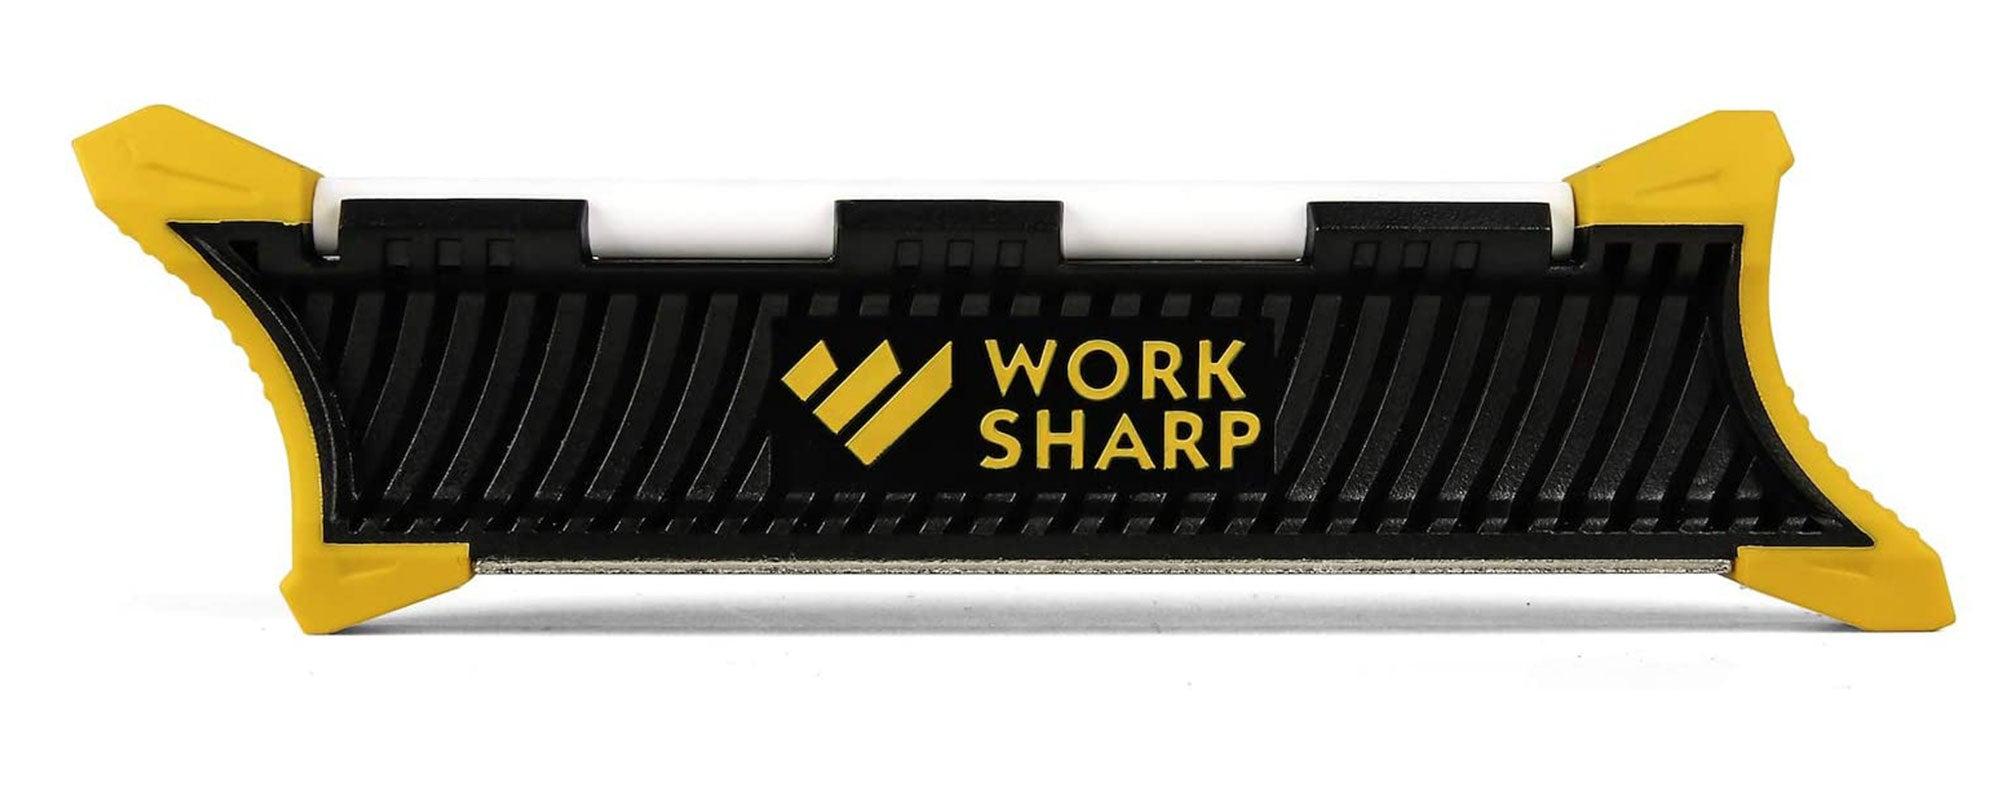 WorkSharp Pocket Knife Sharpener